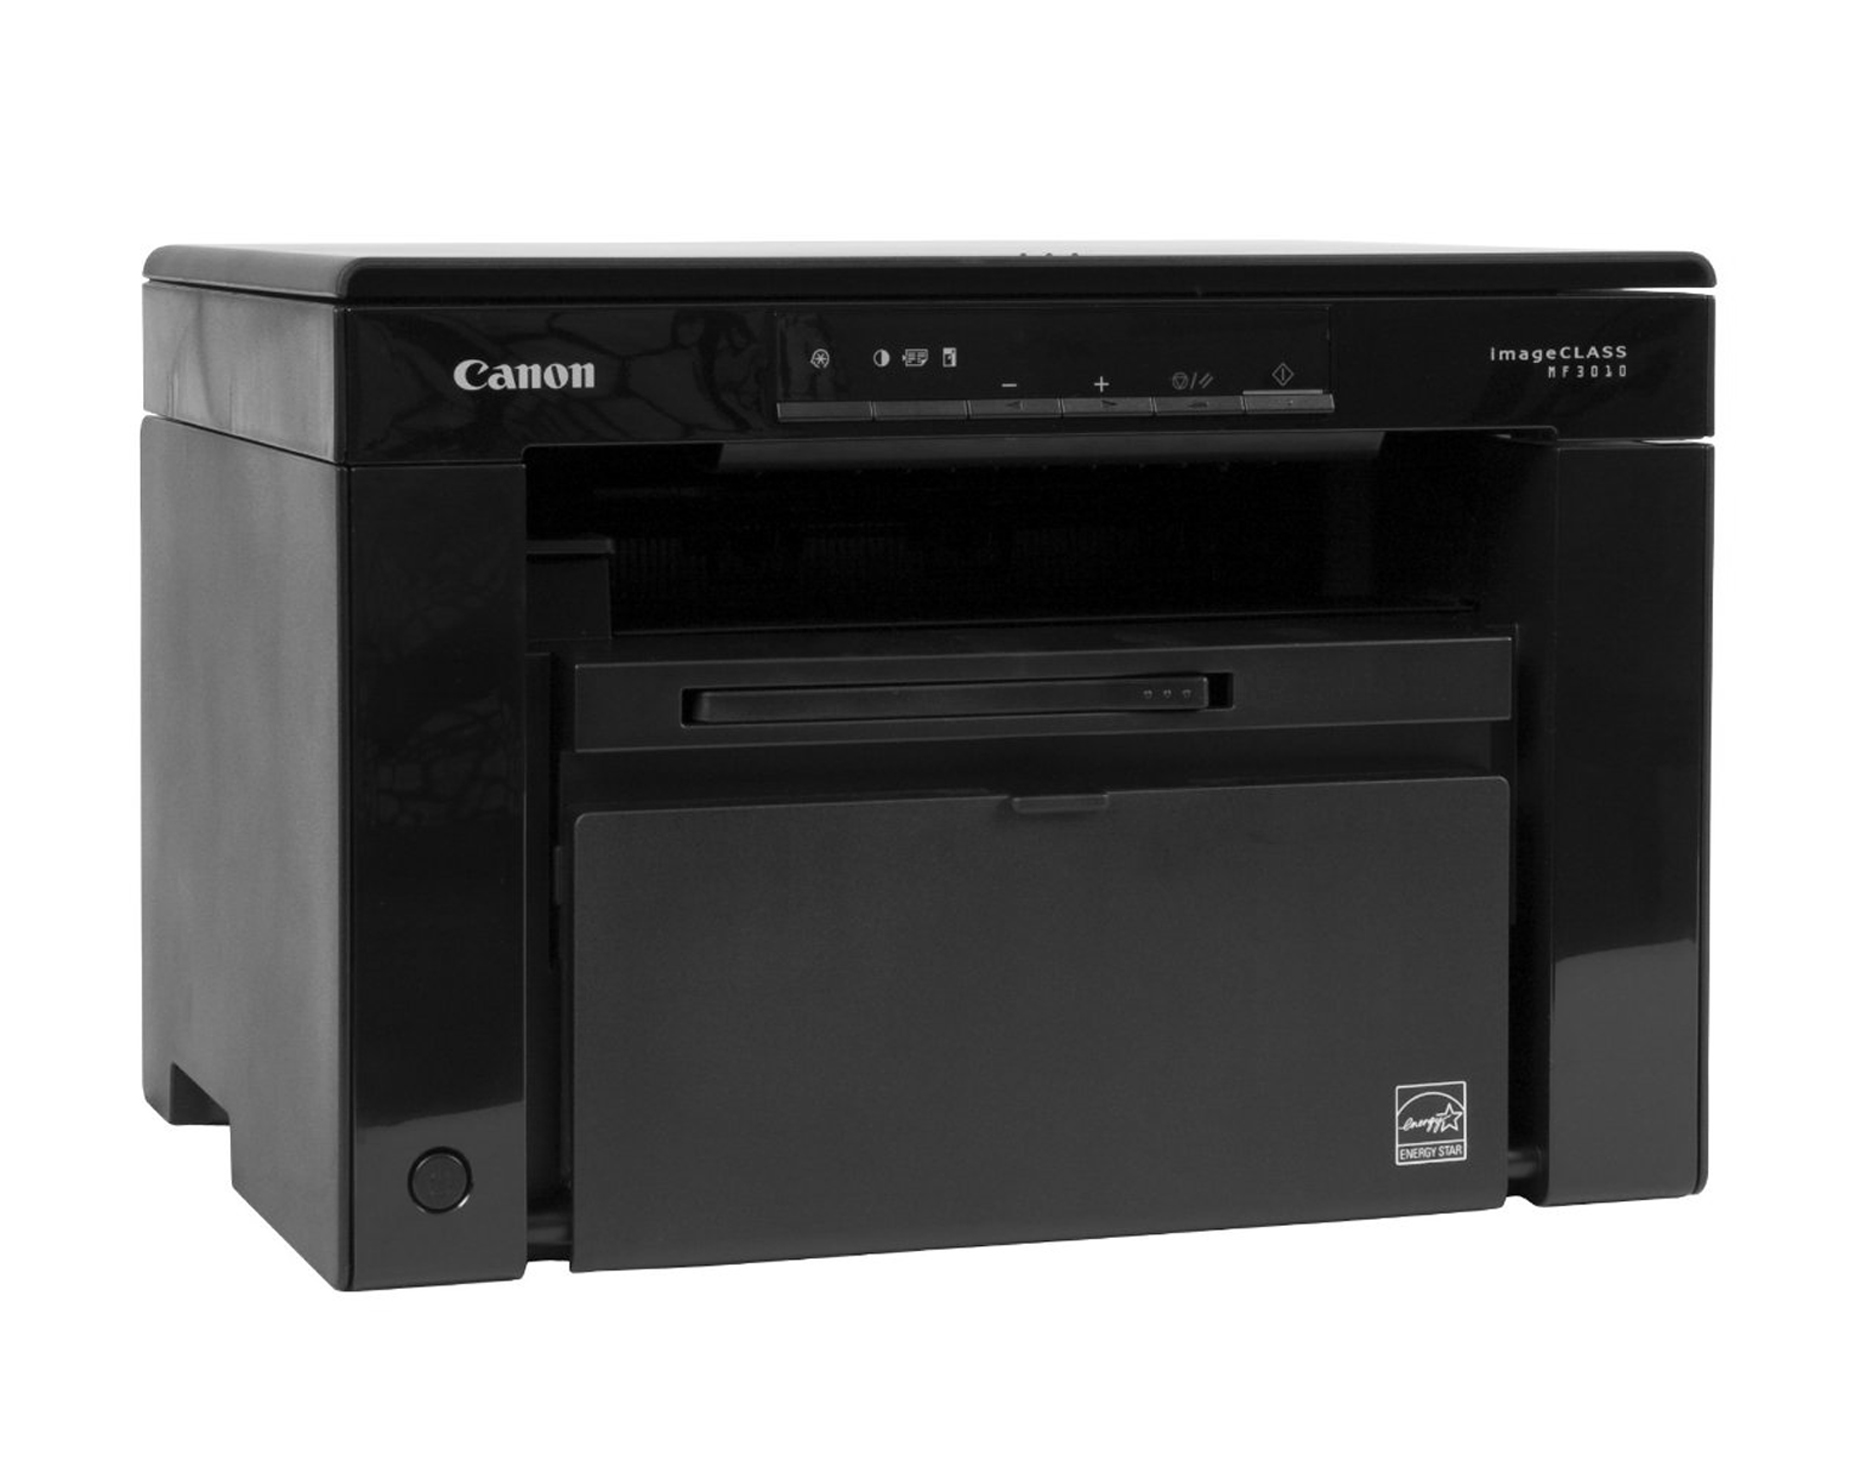 harga printer canon imageclass mf3010 rp 1 746 000 spesifikasi printer